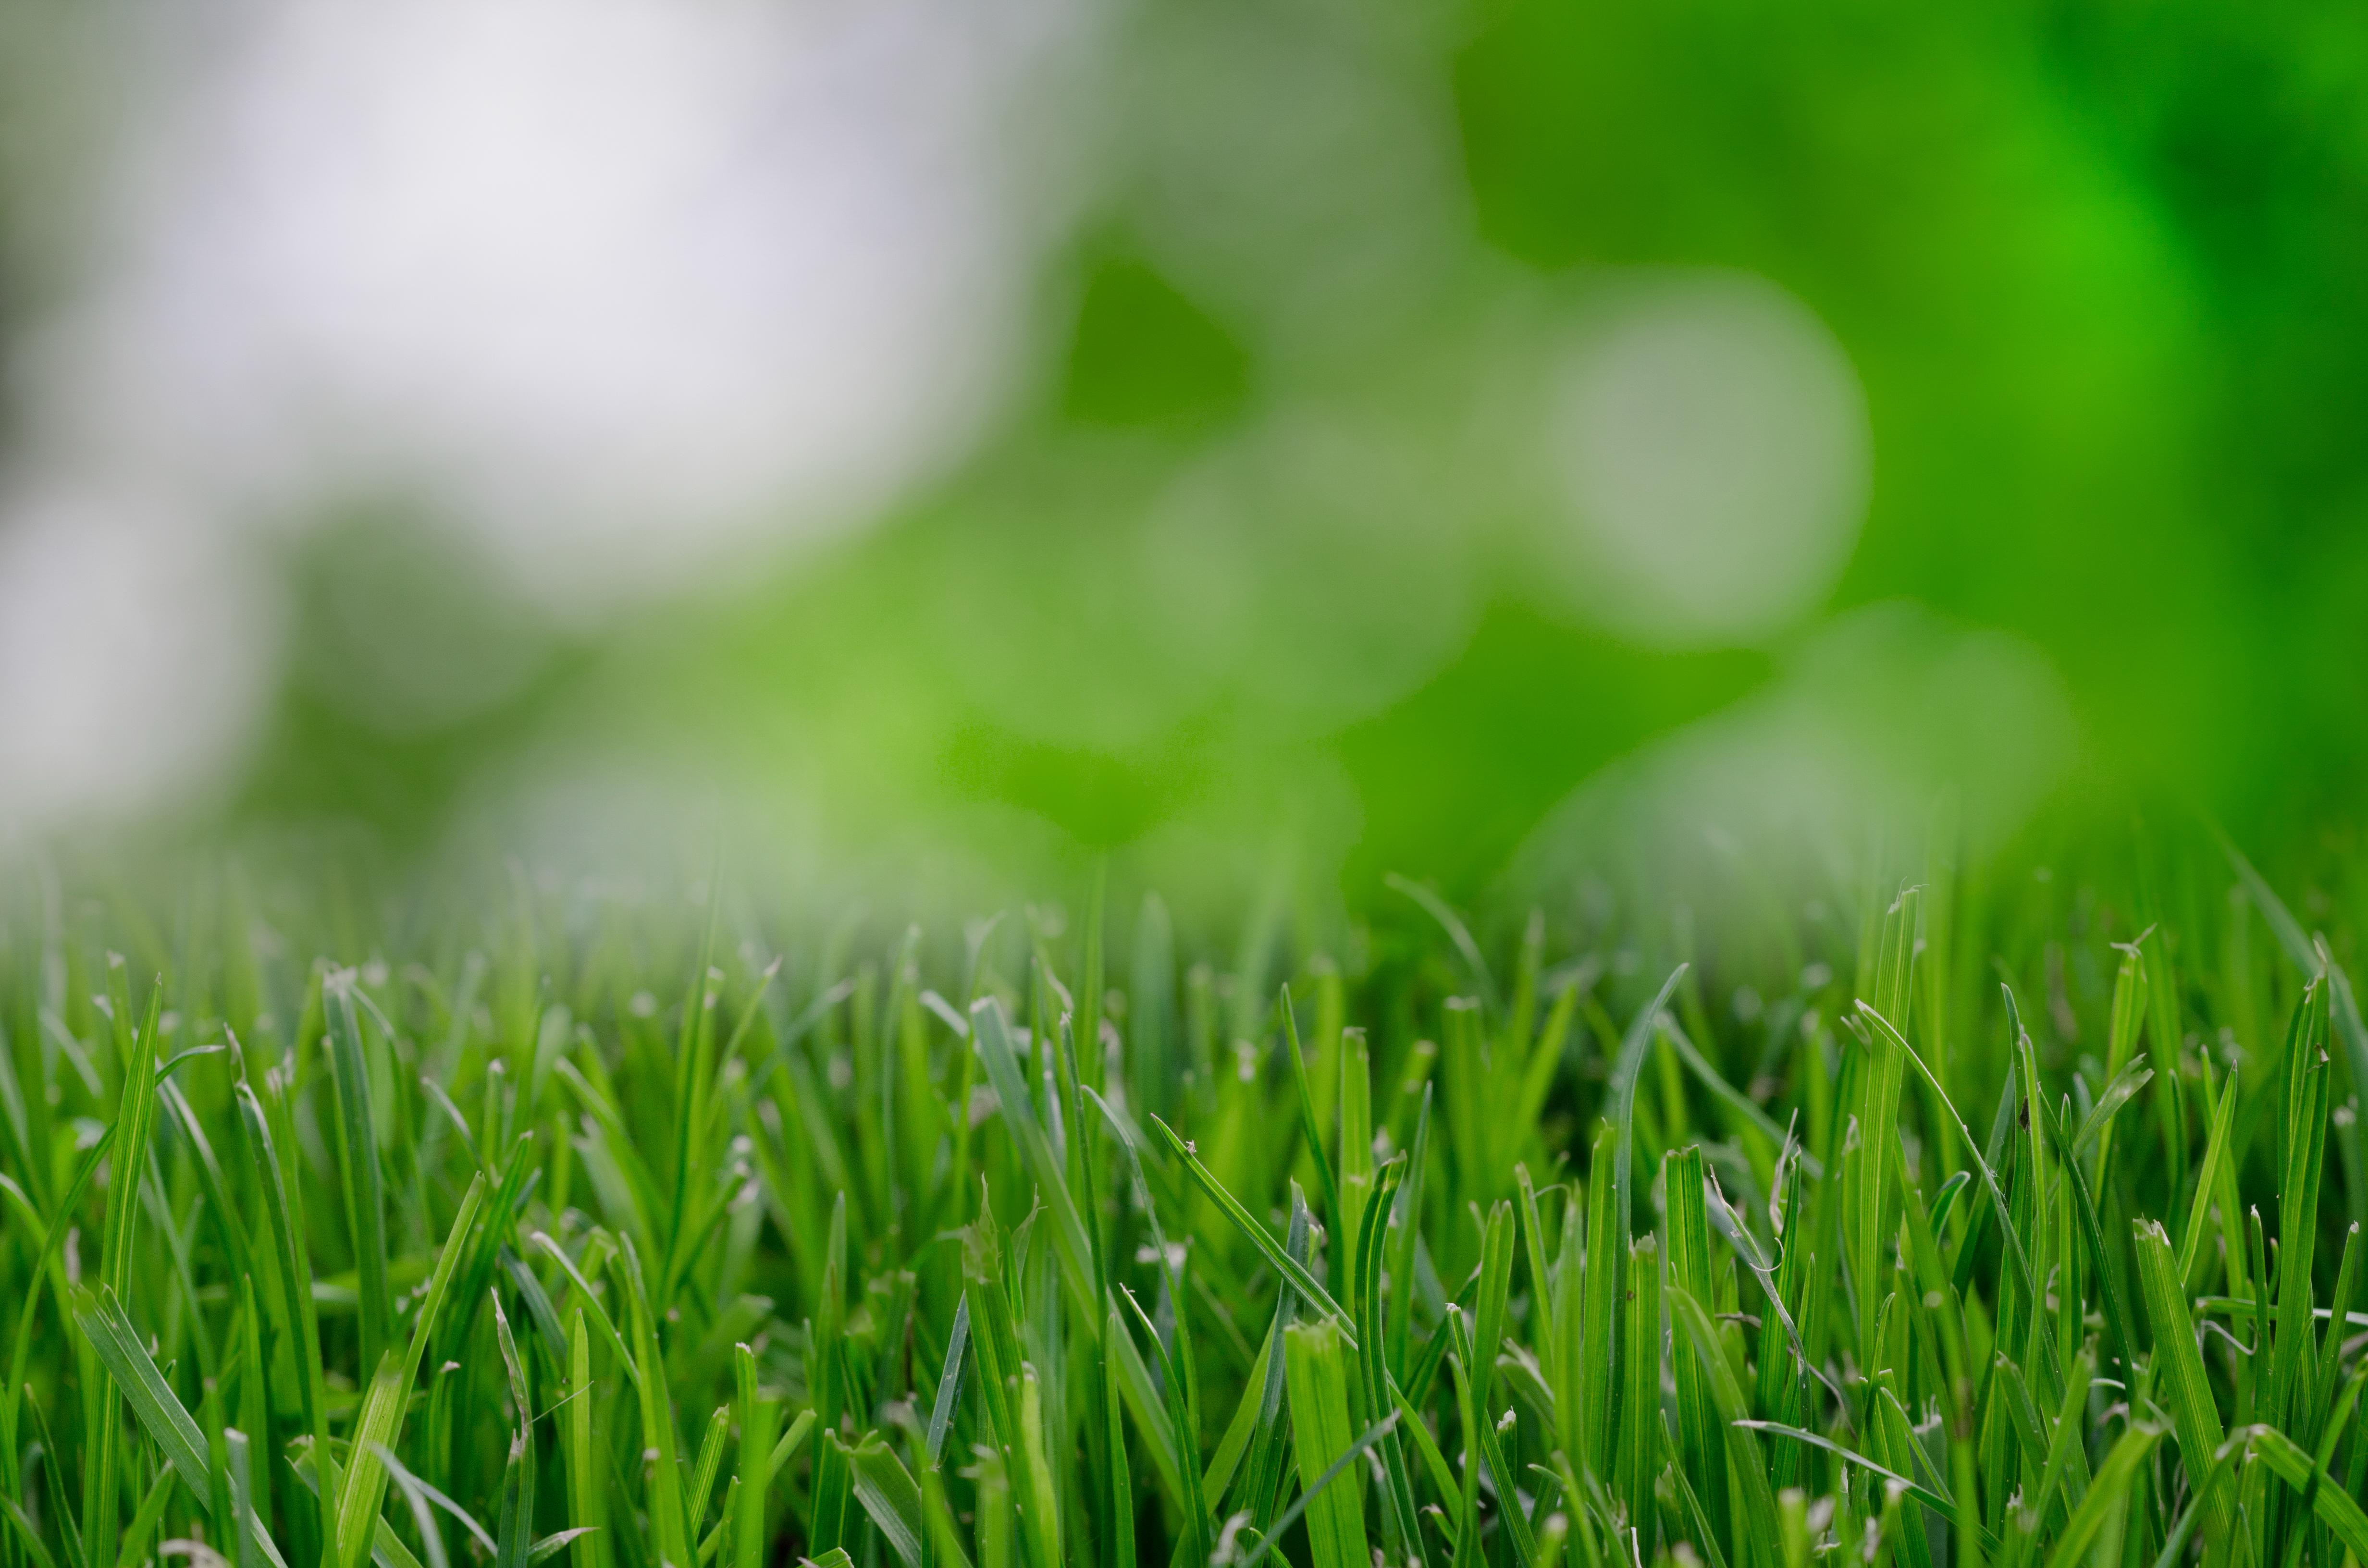 Grass Blur Plant Field Lawn Meadow Sunlight Leaf Flower Environment Green Soil Garden Blurred Eco Close